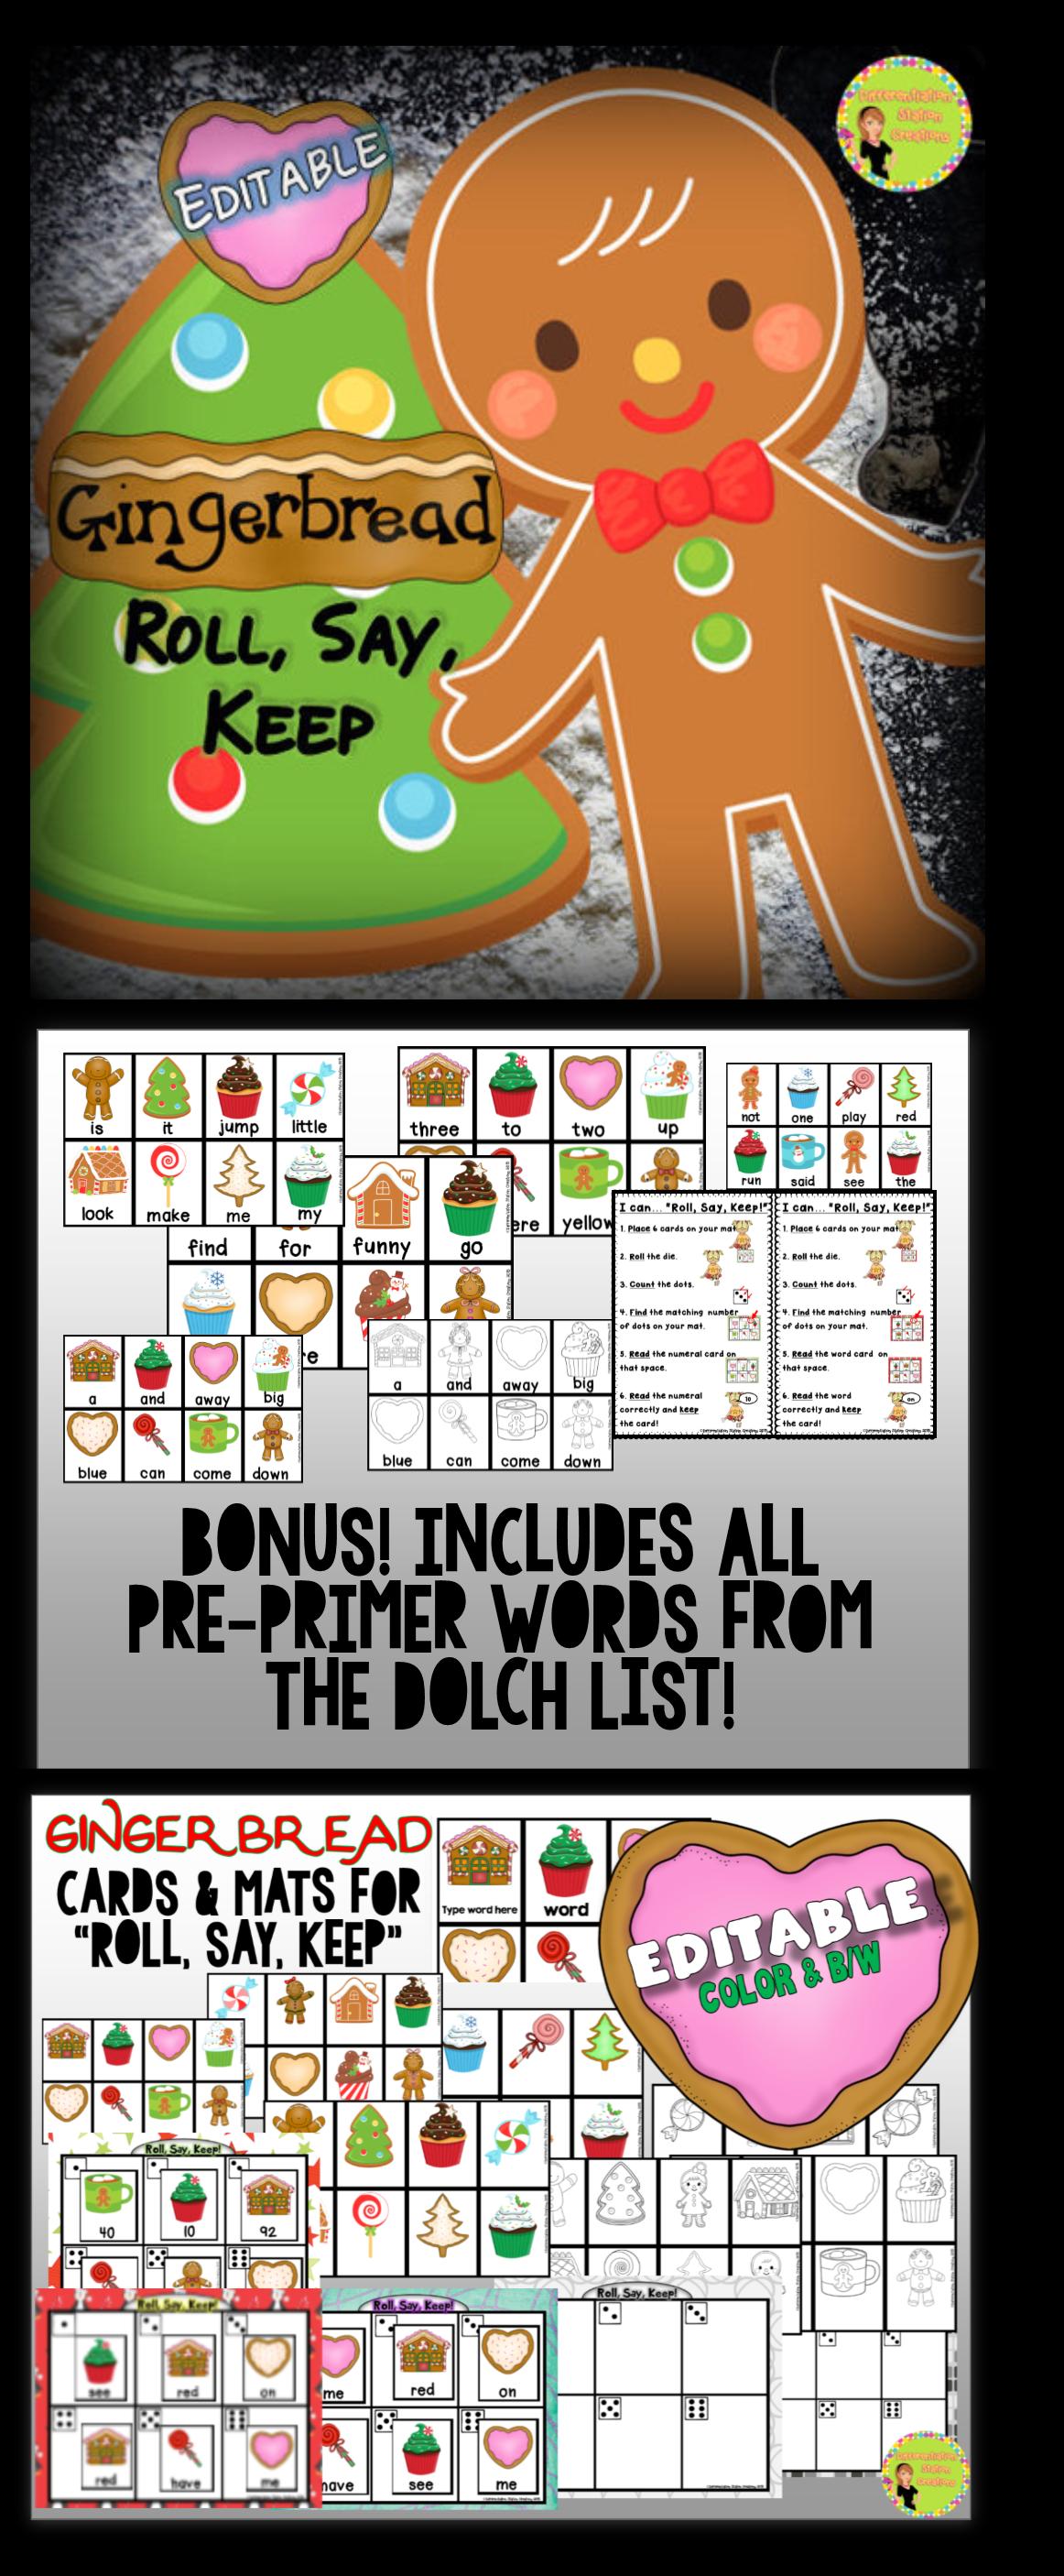 Gingerbread Roll Say Keep Editable Includes Editable